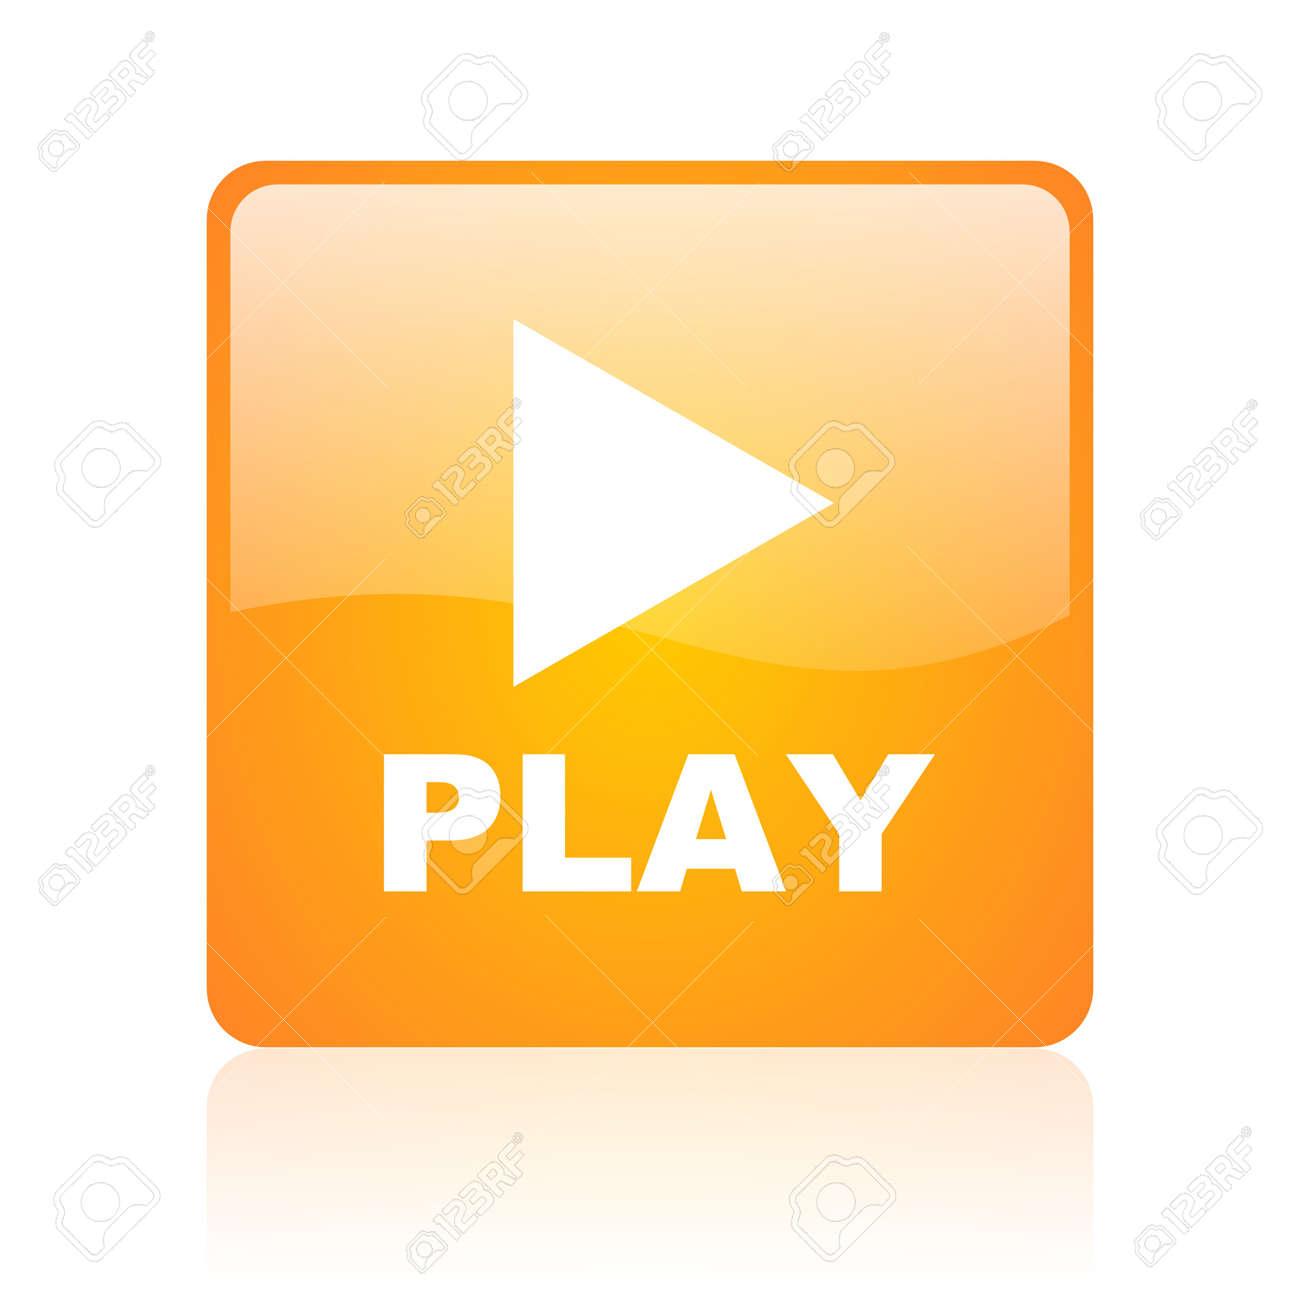 play orange square glossy web icon Stock Photo - 18361025